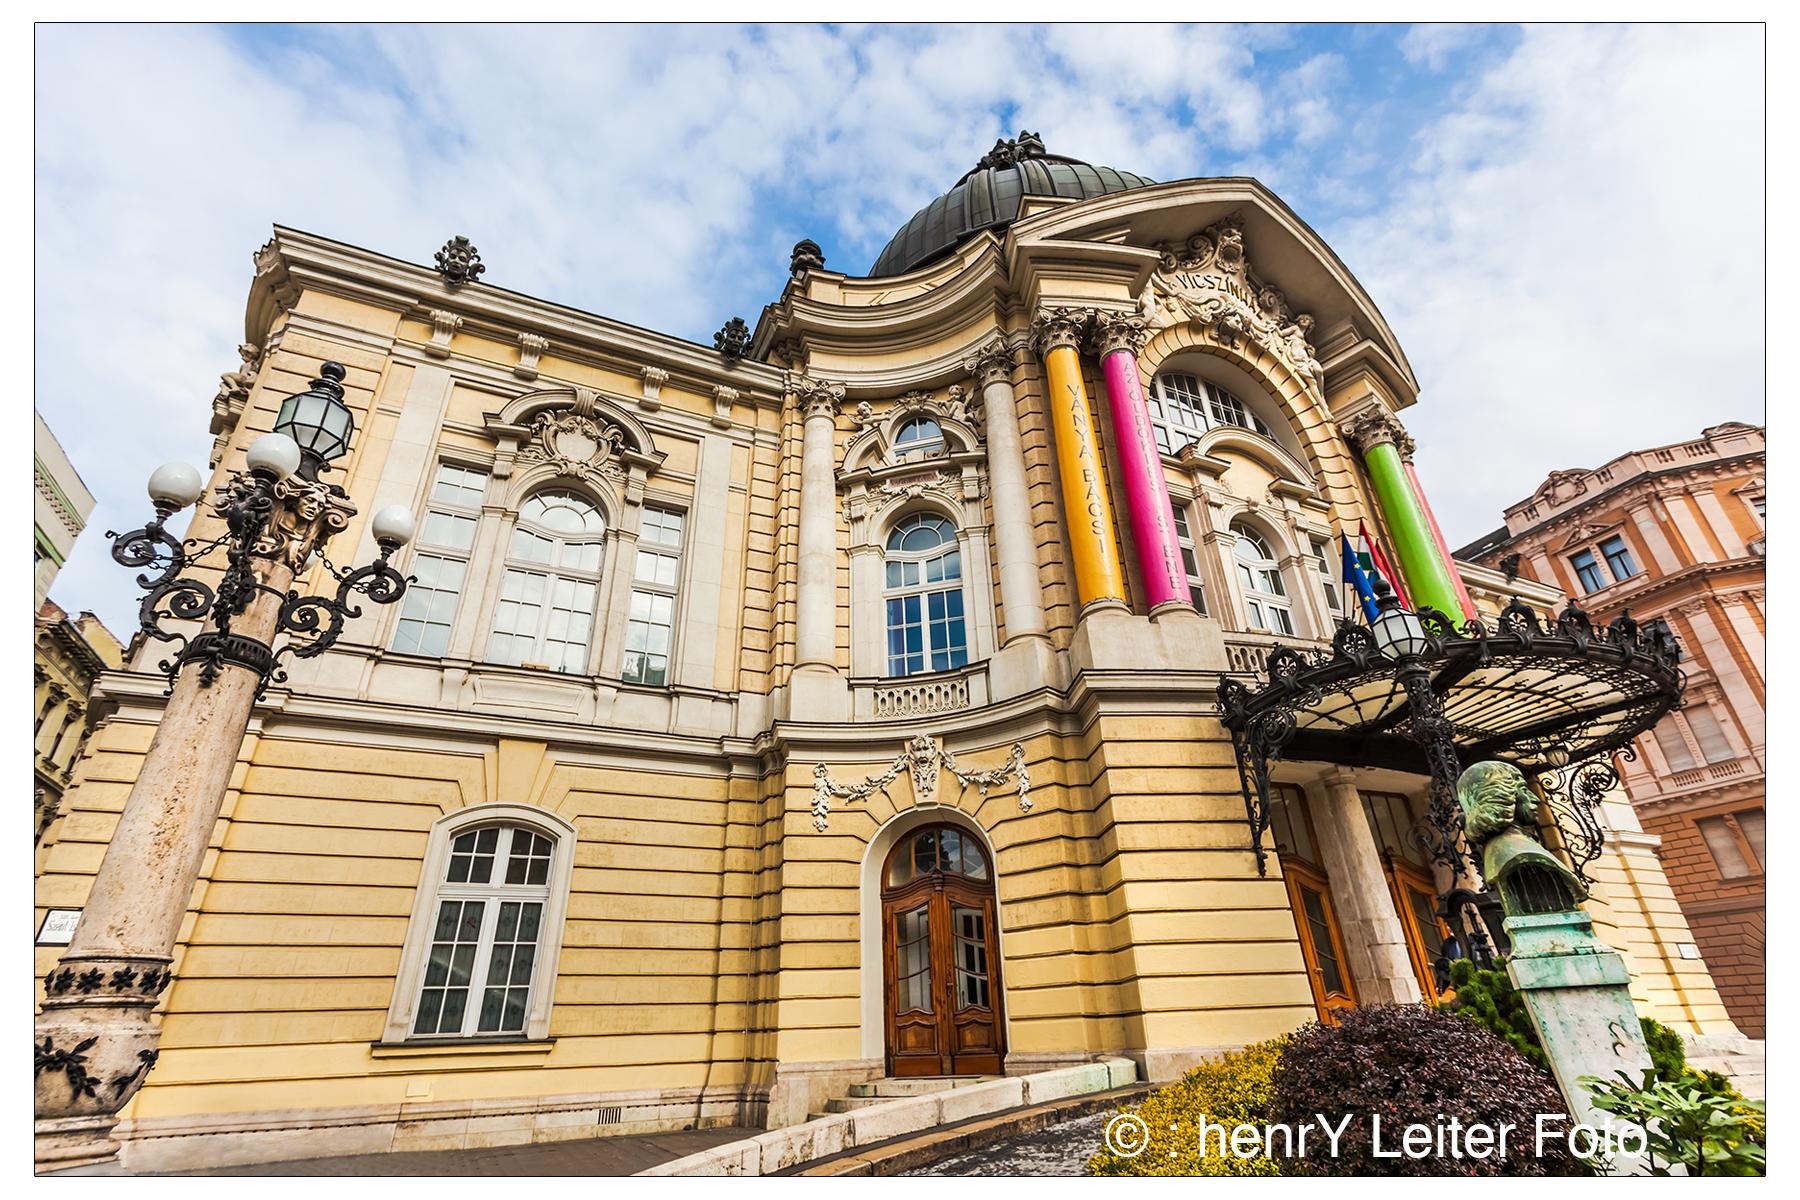 Vígszínház - or Comedy Theatre in Budapest, Hungary